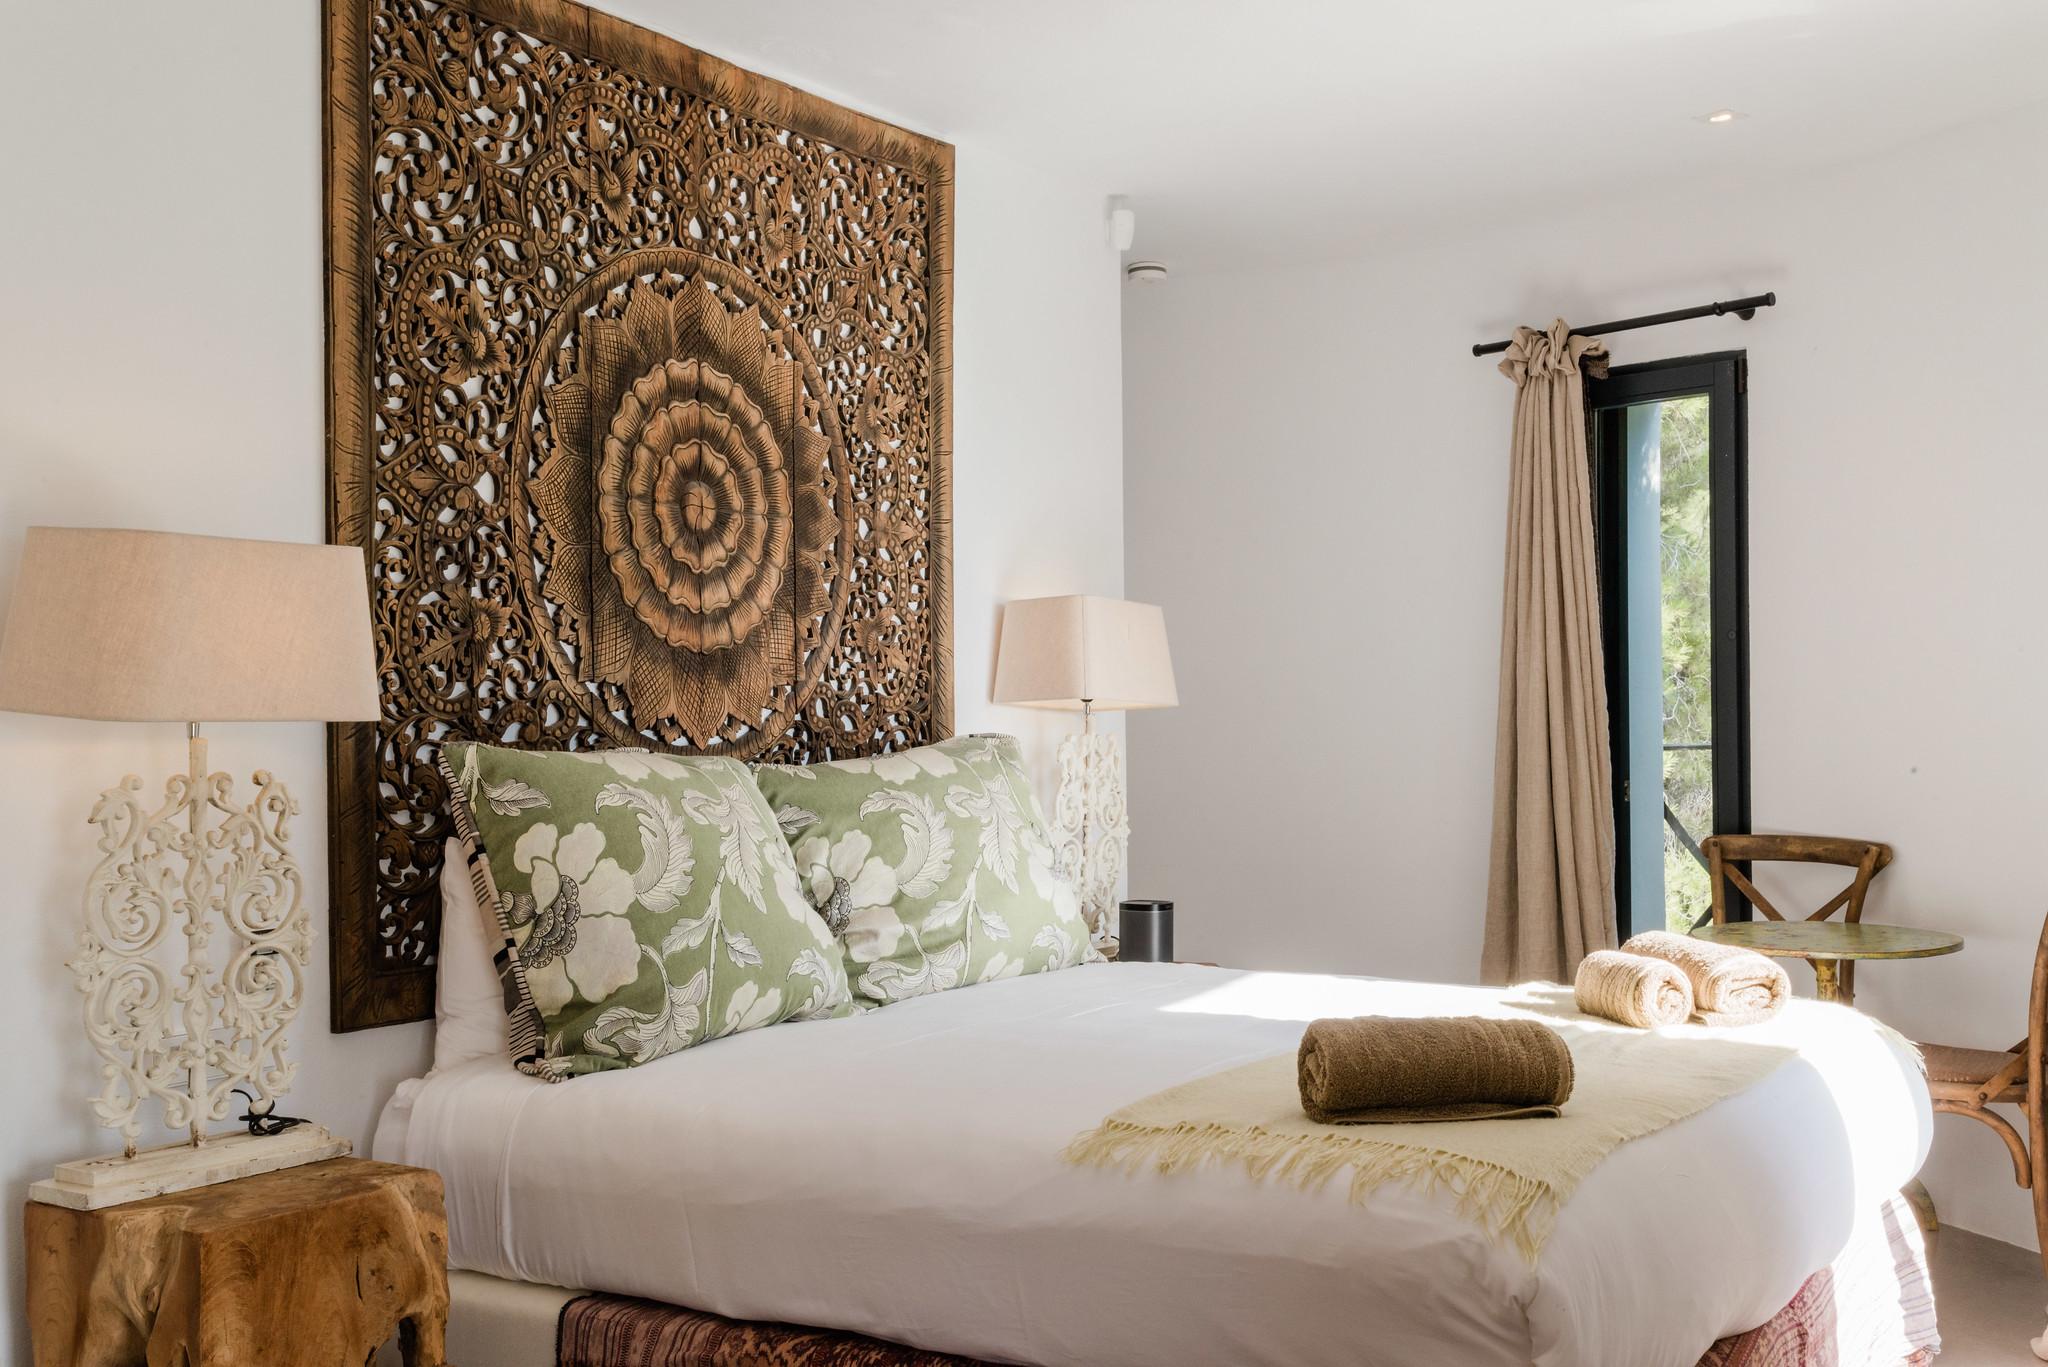 https://www.white-ibiza.com/wp-content/uploads/2020/05/white-ibiza-villas-casa-amalia-interior-bedroom-1.jpg